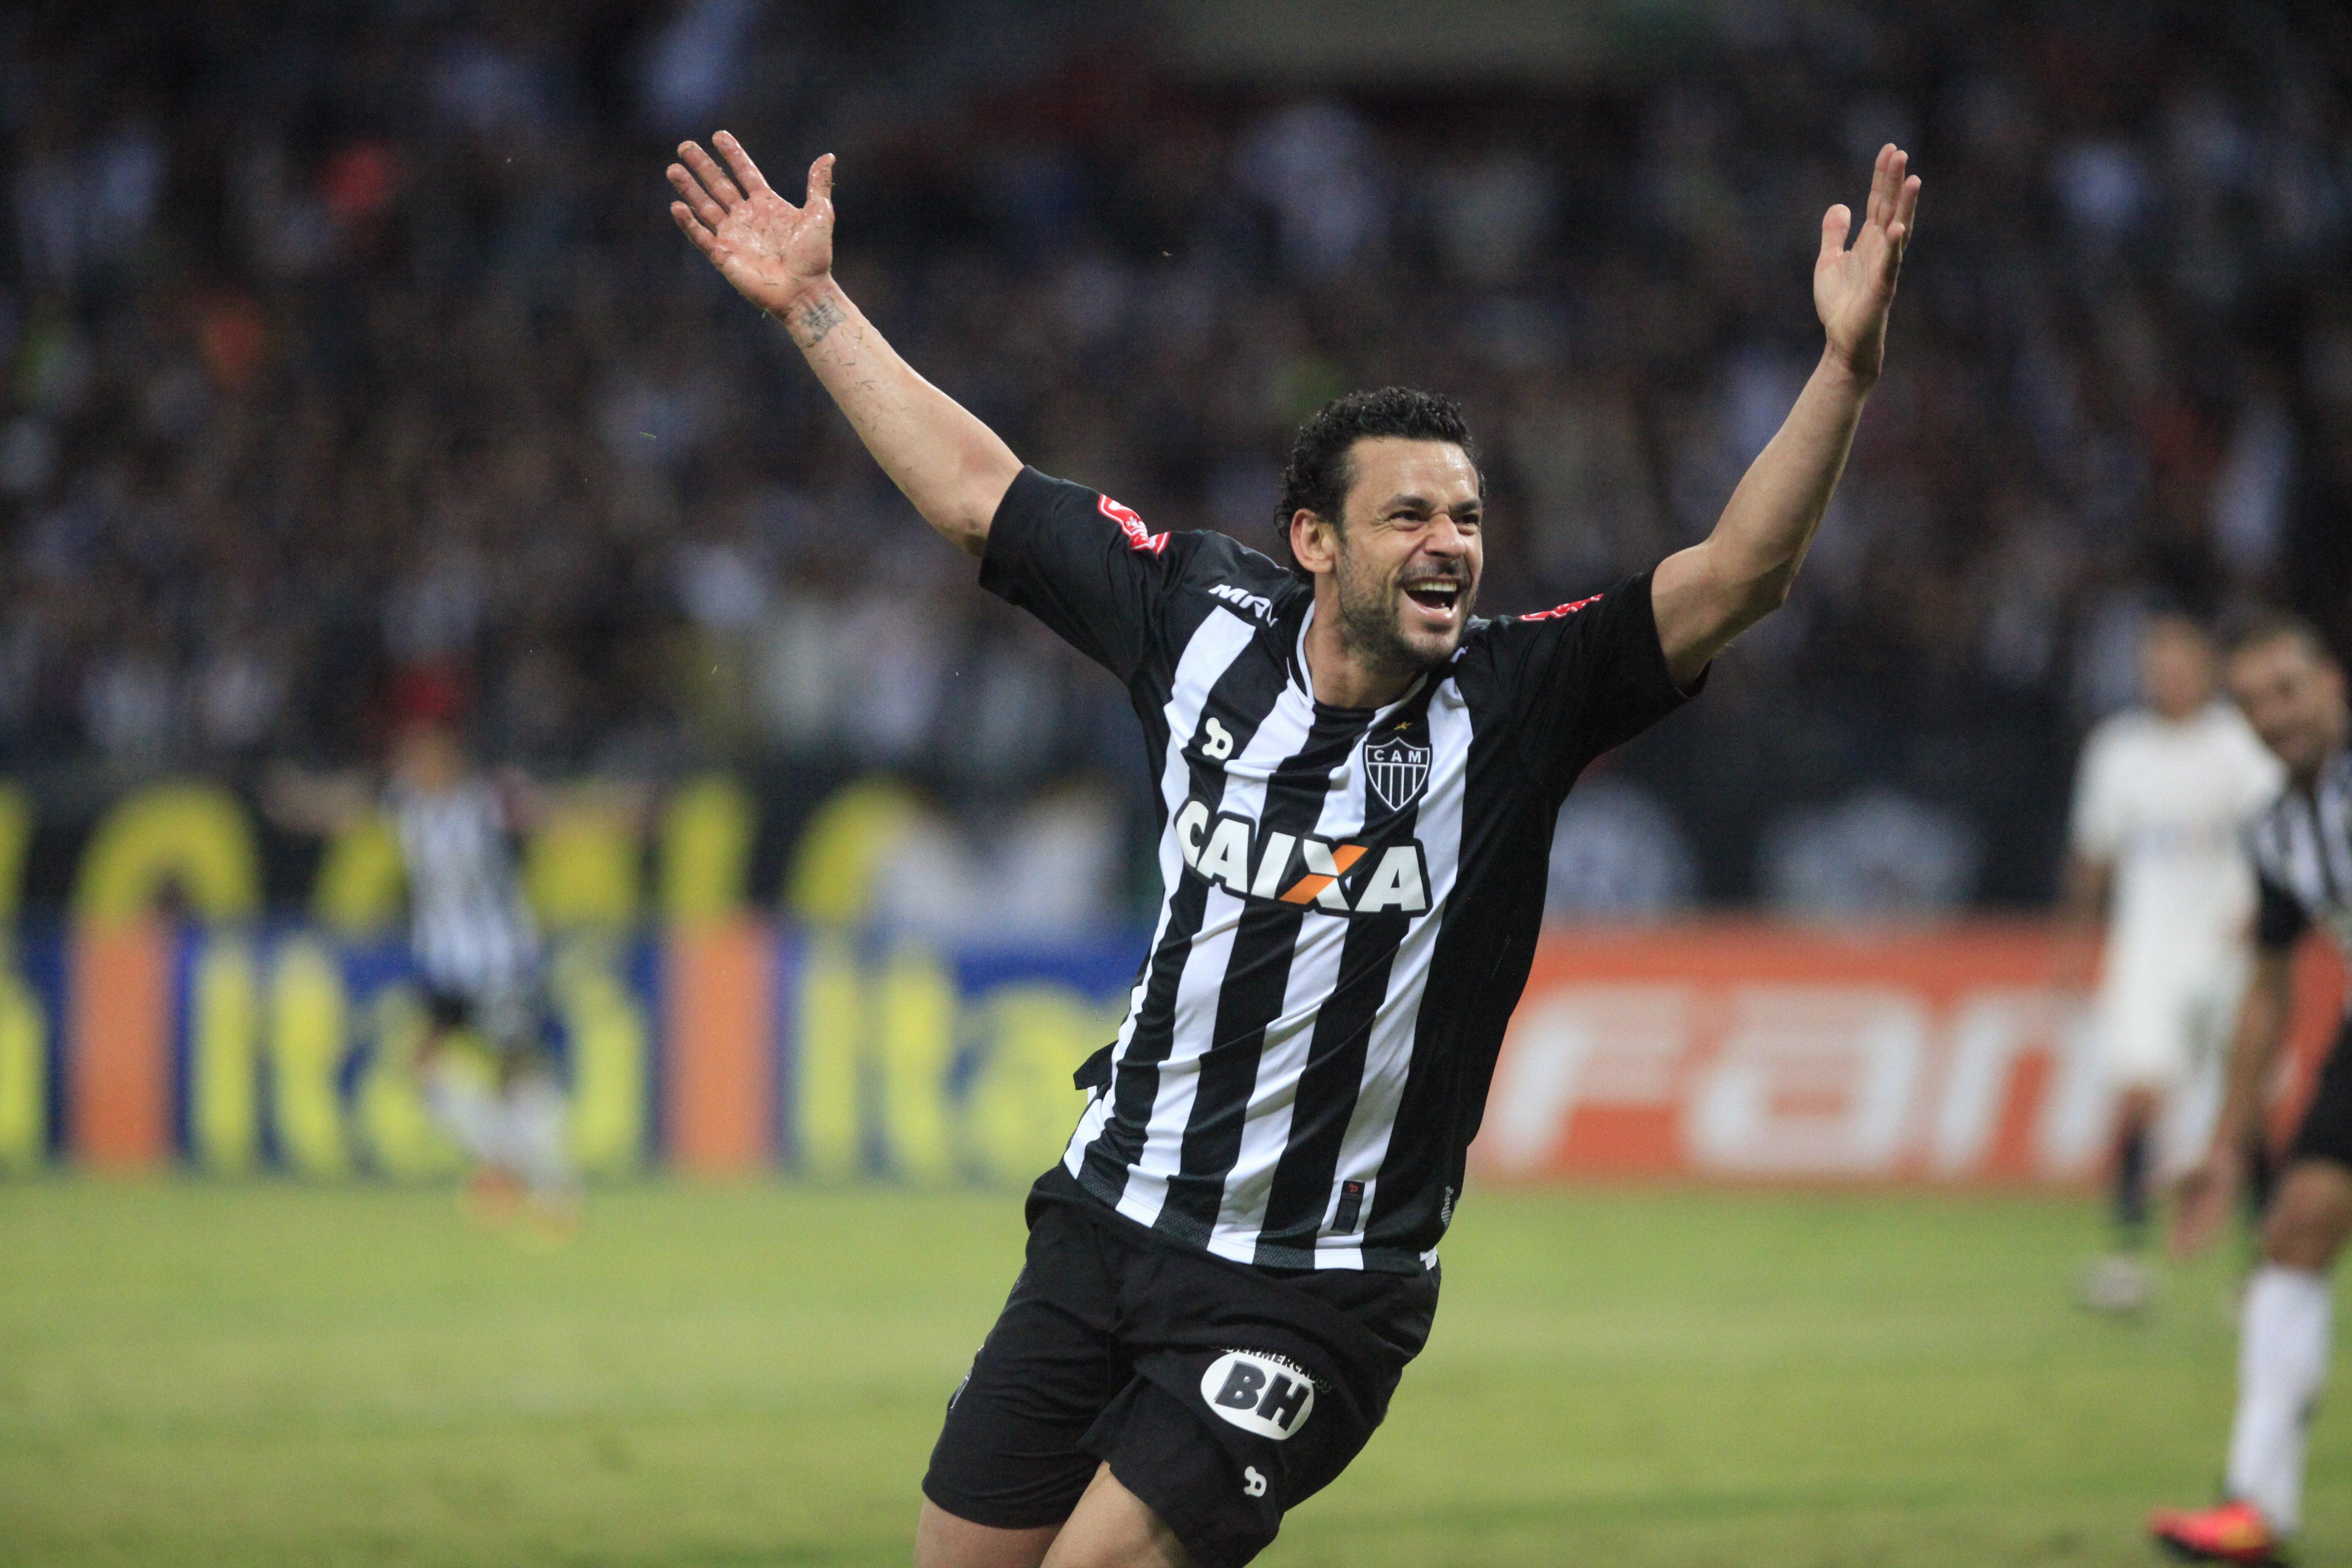 784d80e4f9 Atlético-MG X Corinthians - Campeonato Brasileiro 2016